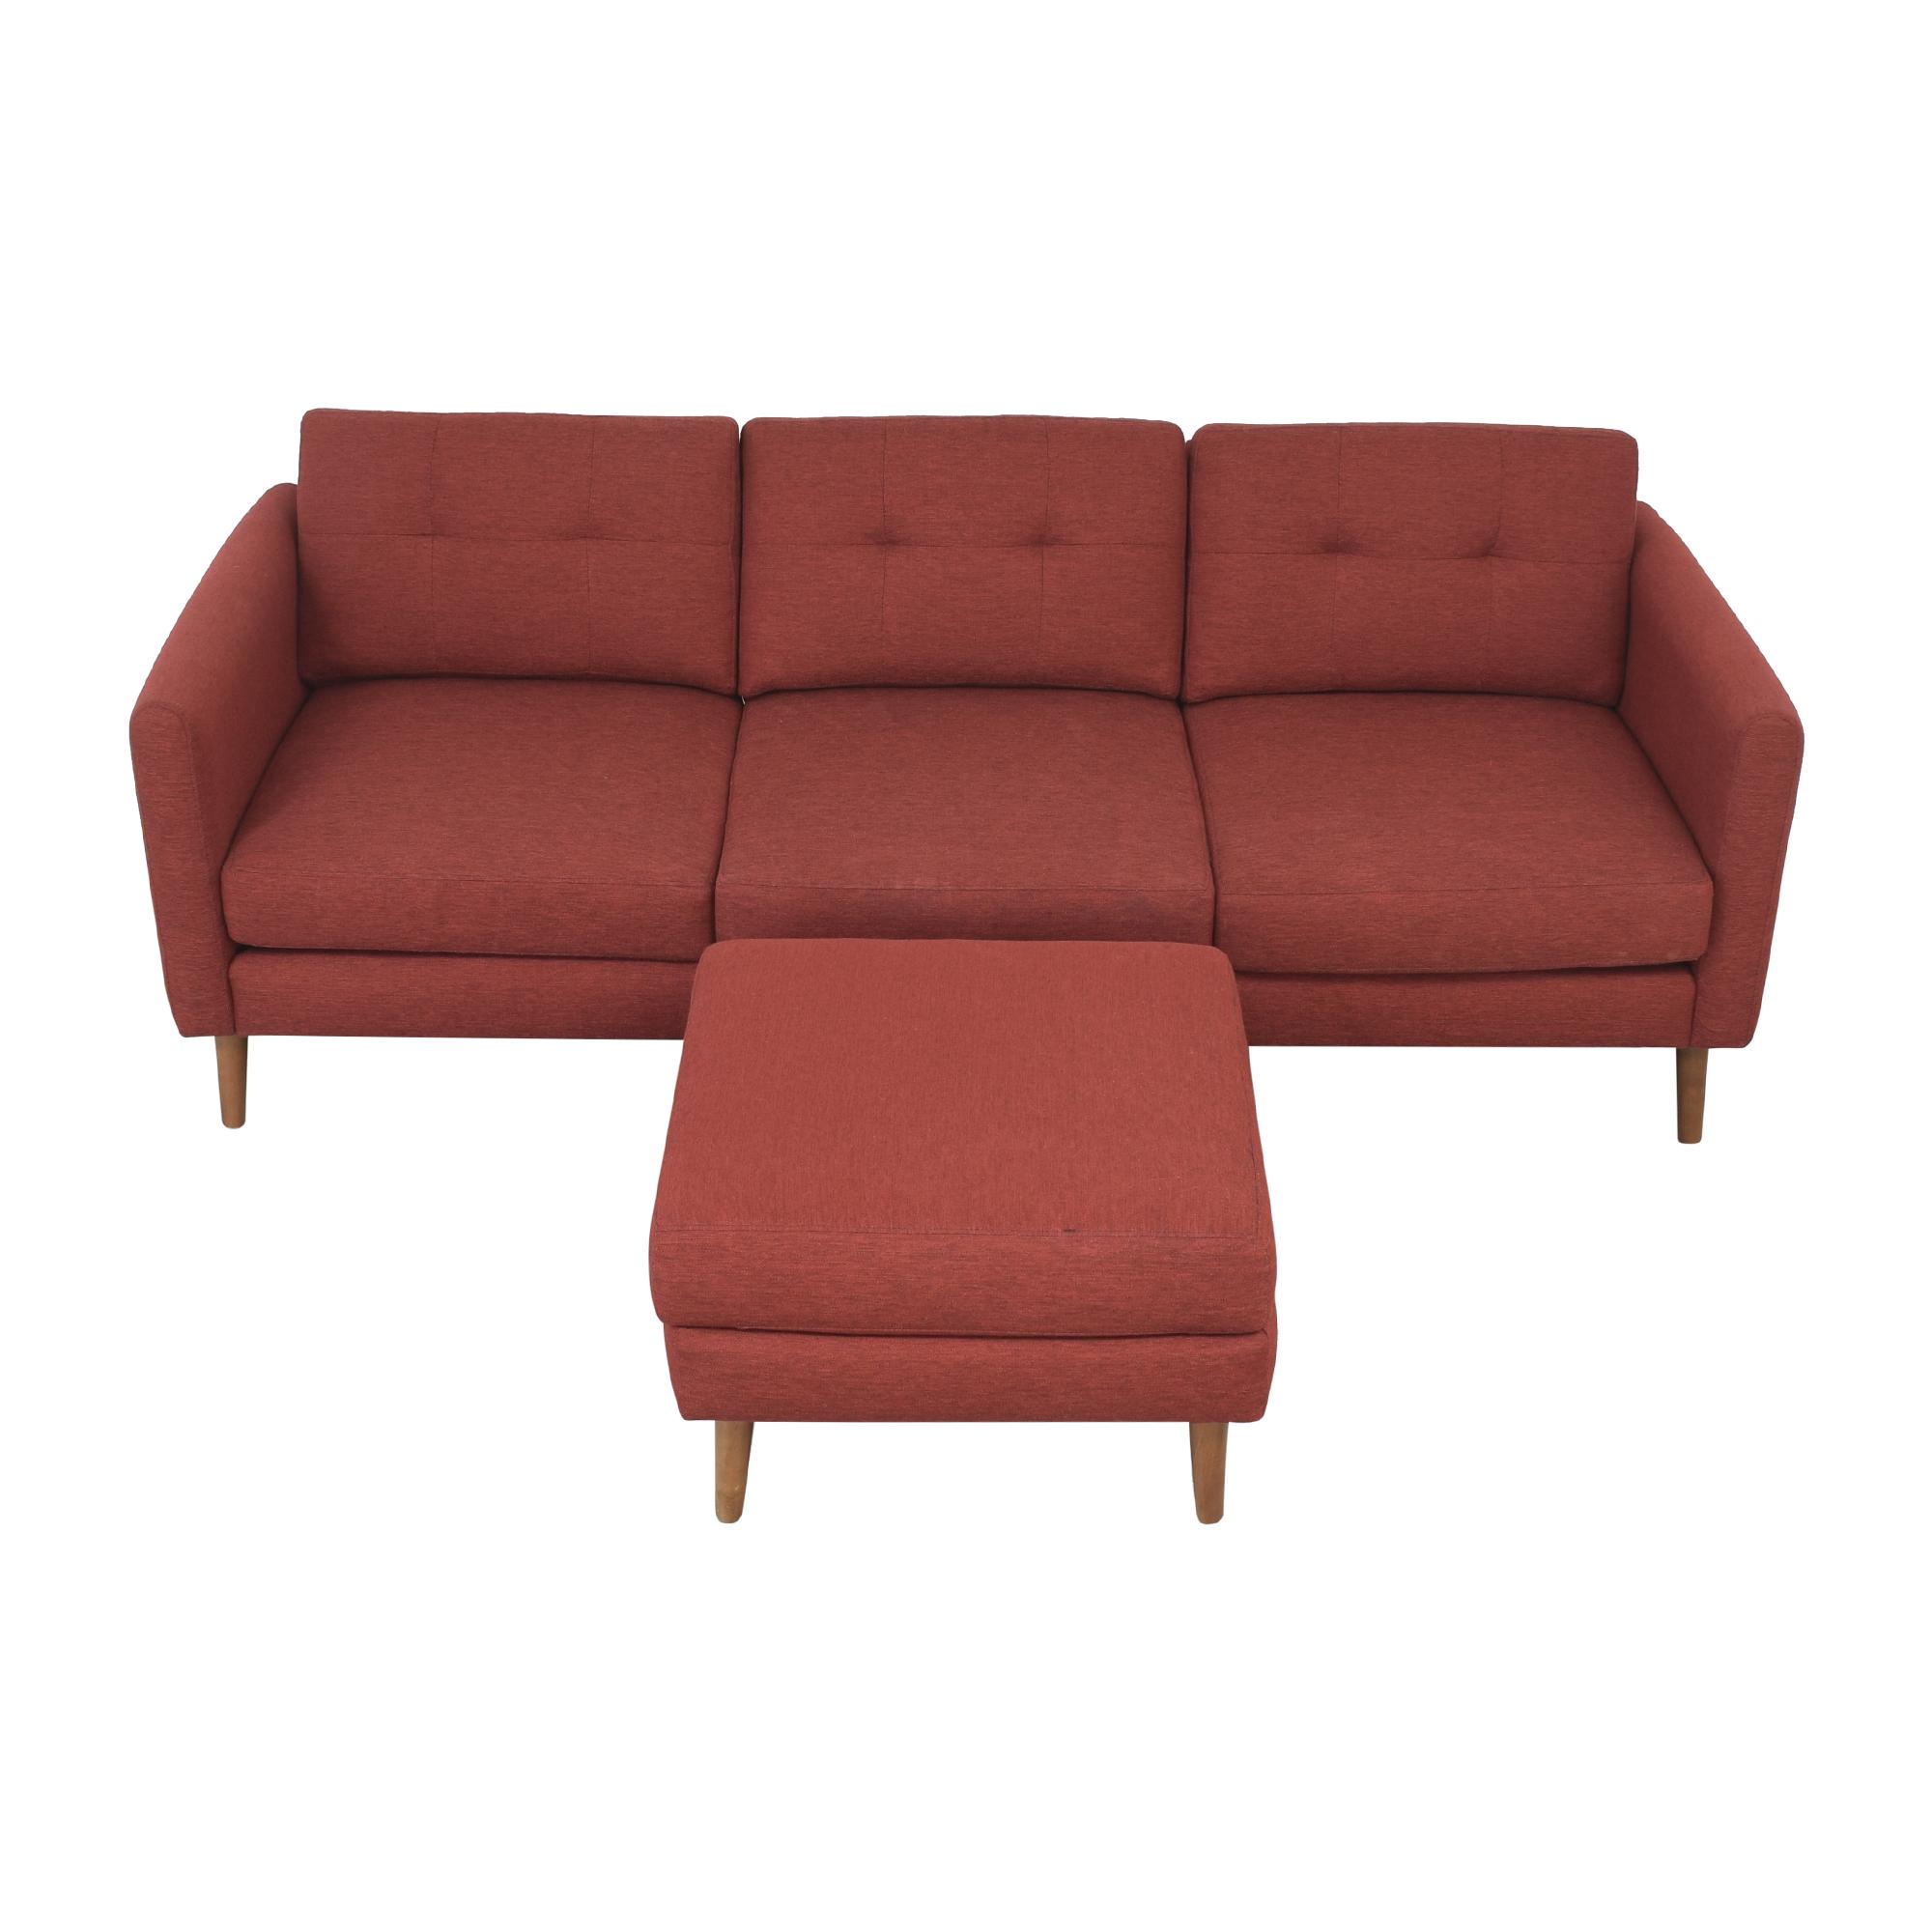 buy Burrow Block Nomad Sofa with Ottoman Burrow Sofas